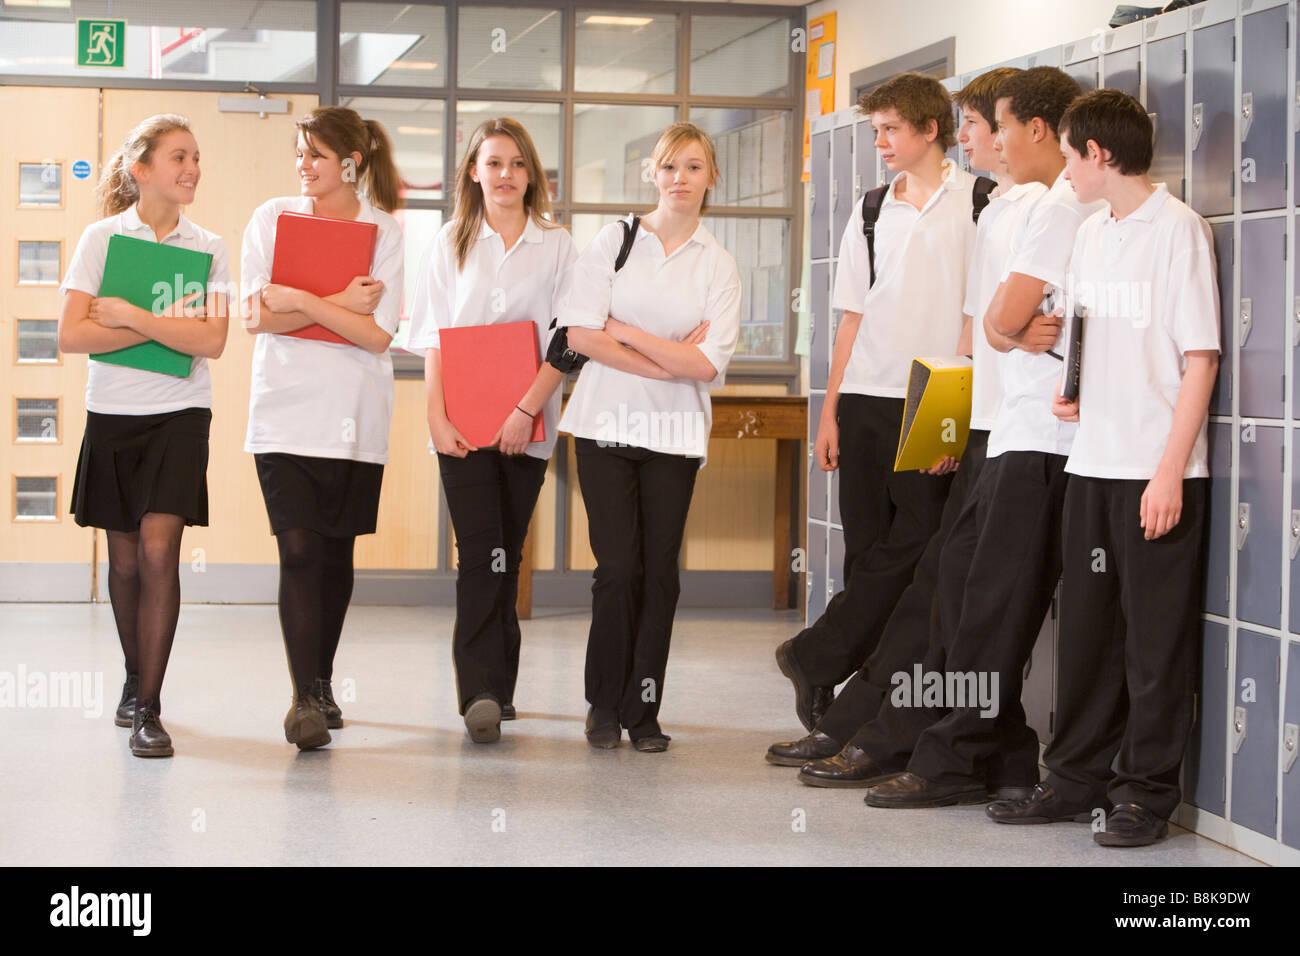 Secondary school students in a school hallway Stock Photo